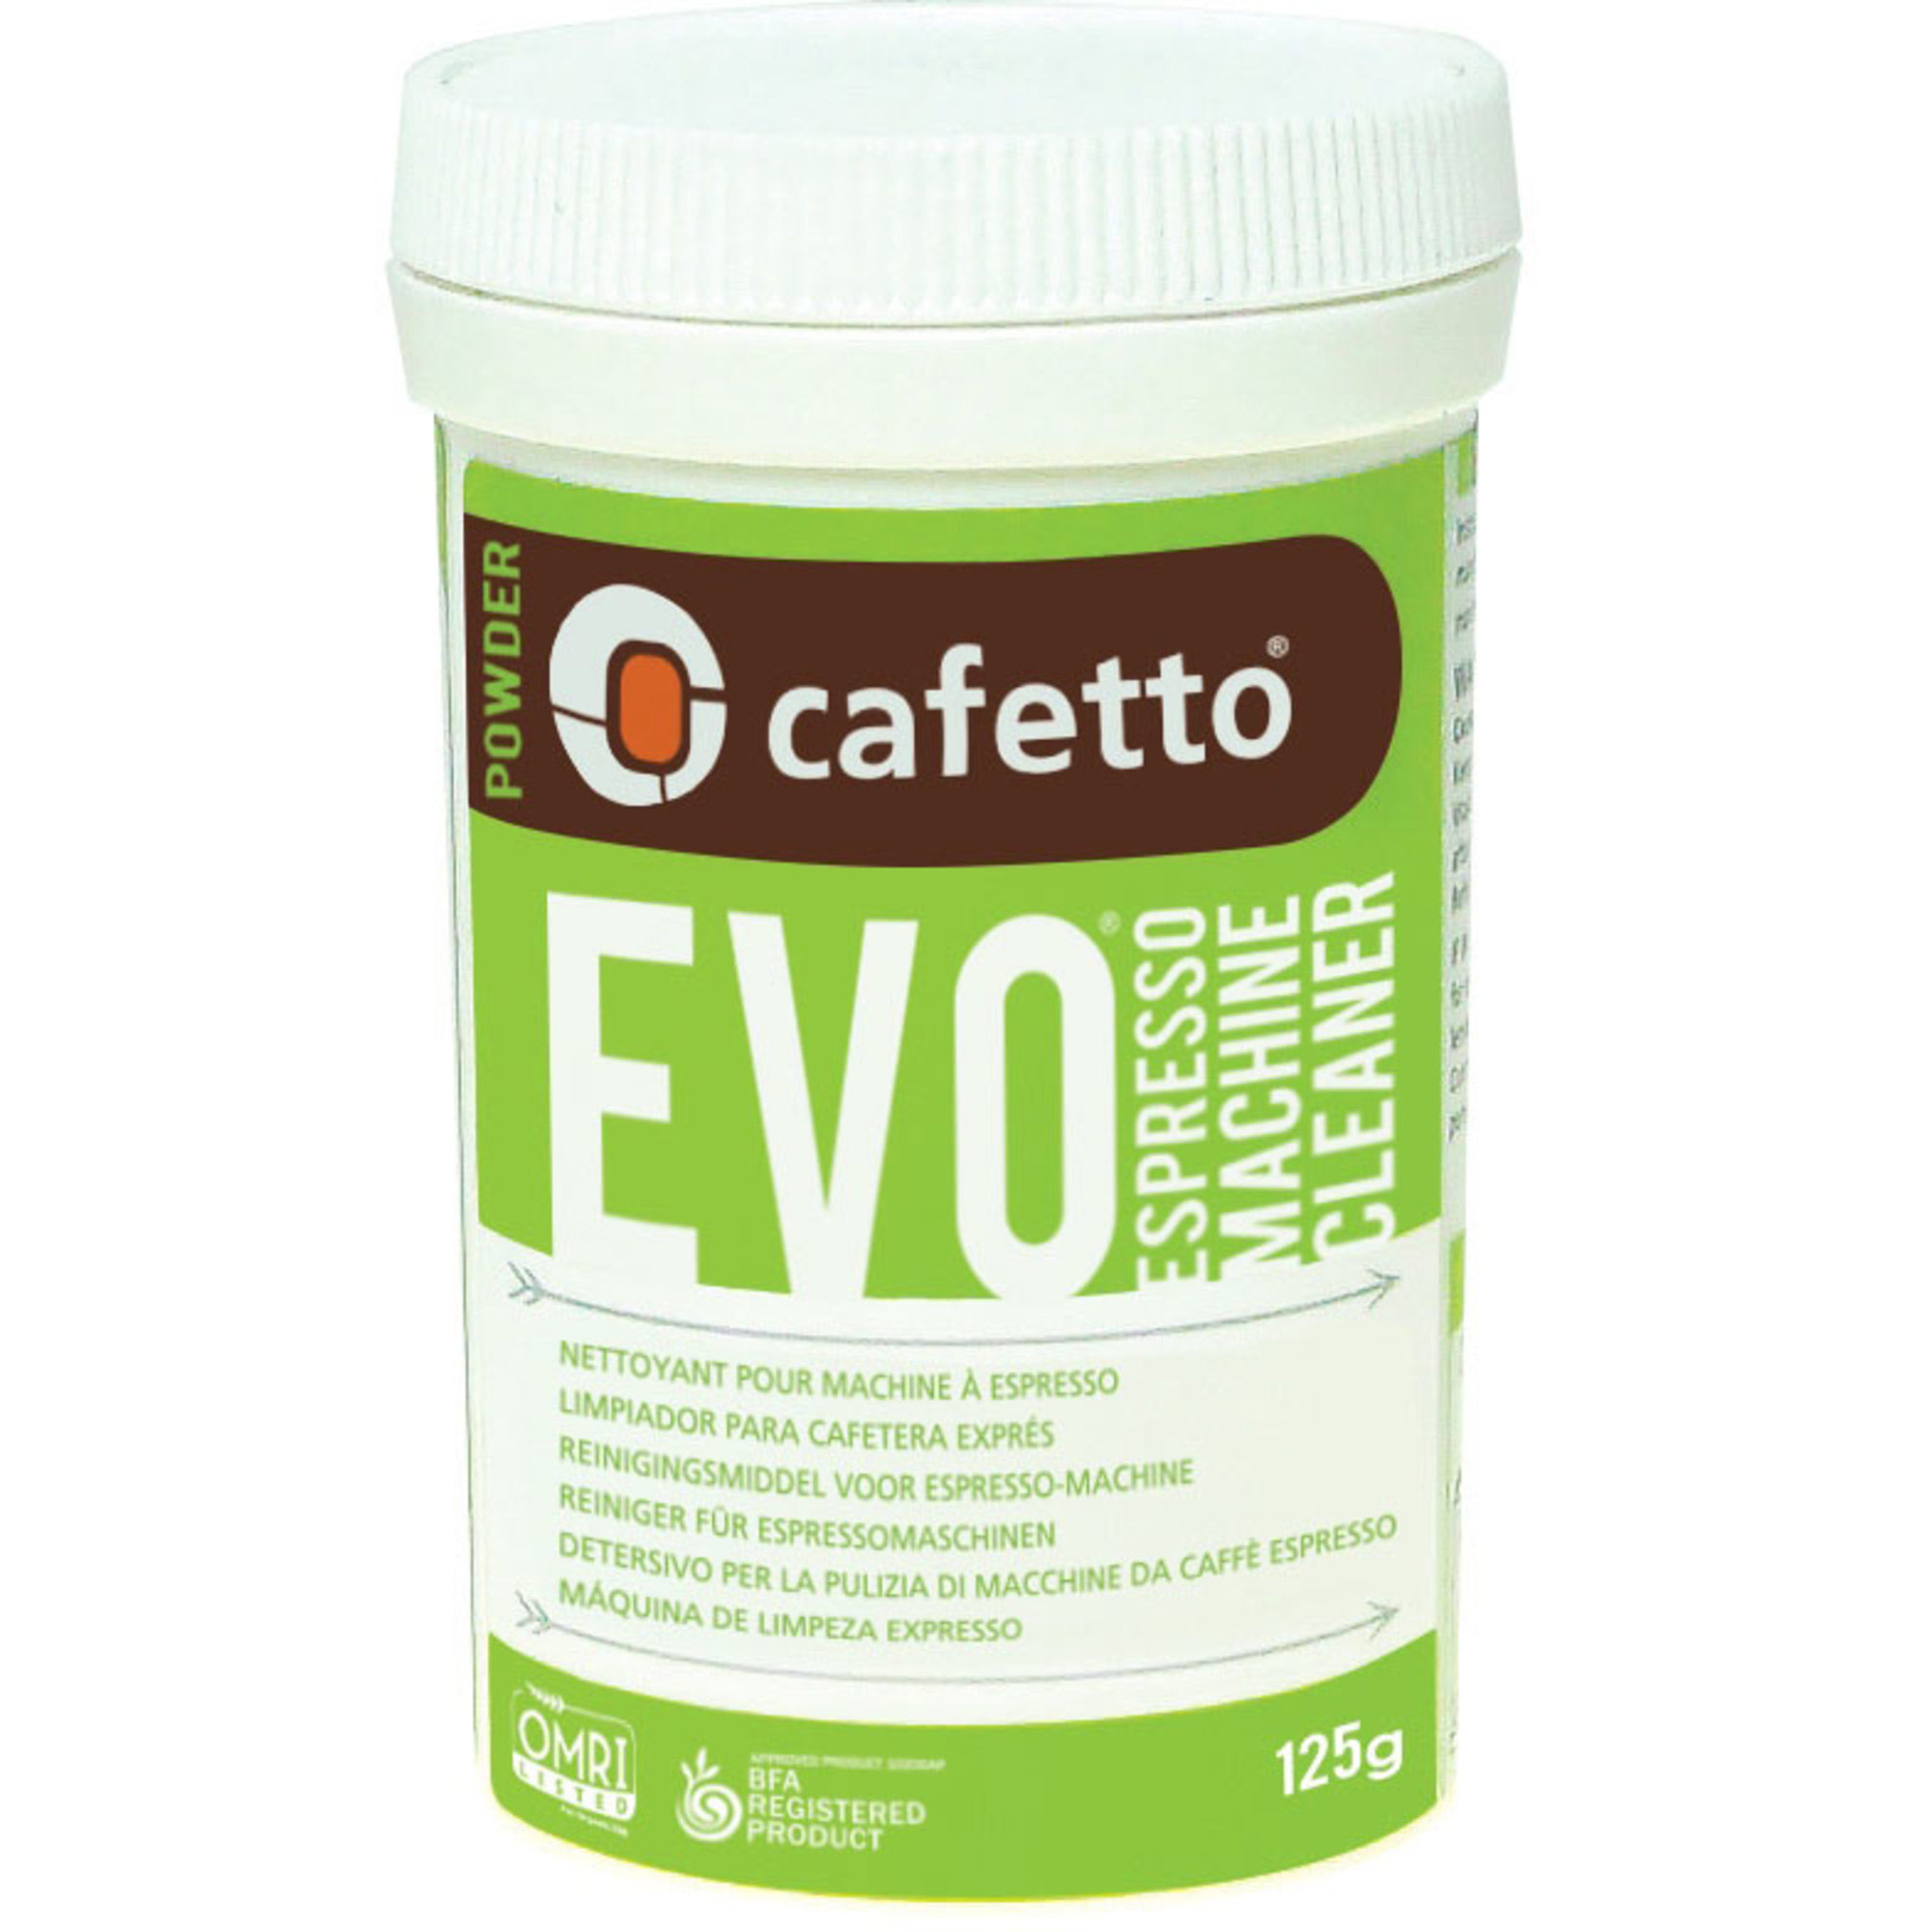 Cafetto EVO Rengöringspulver 125 g.